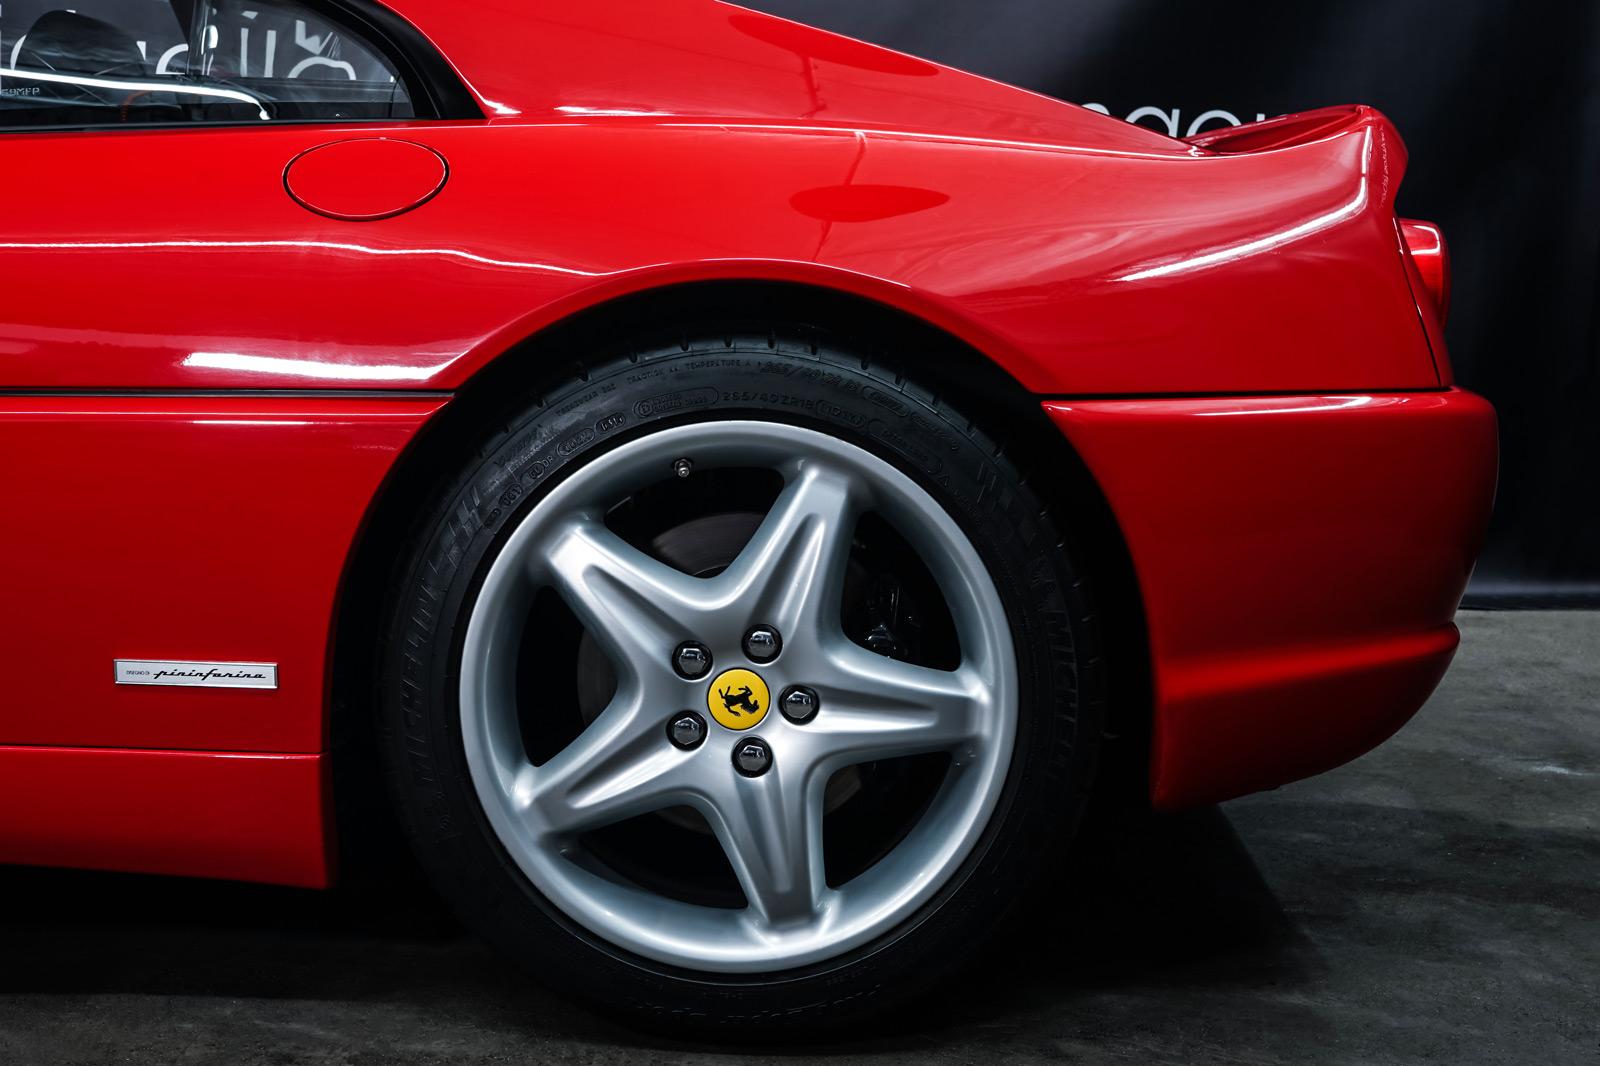 Ferrari_F355_Berlinetta_Rot_Schwarz_FER-7159_4_w